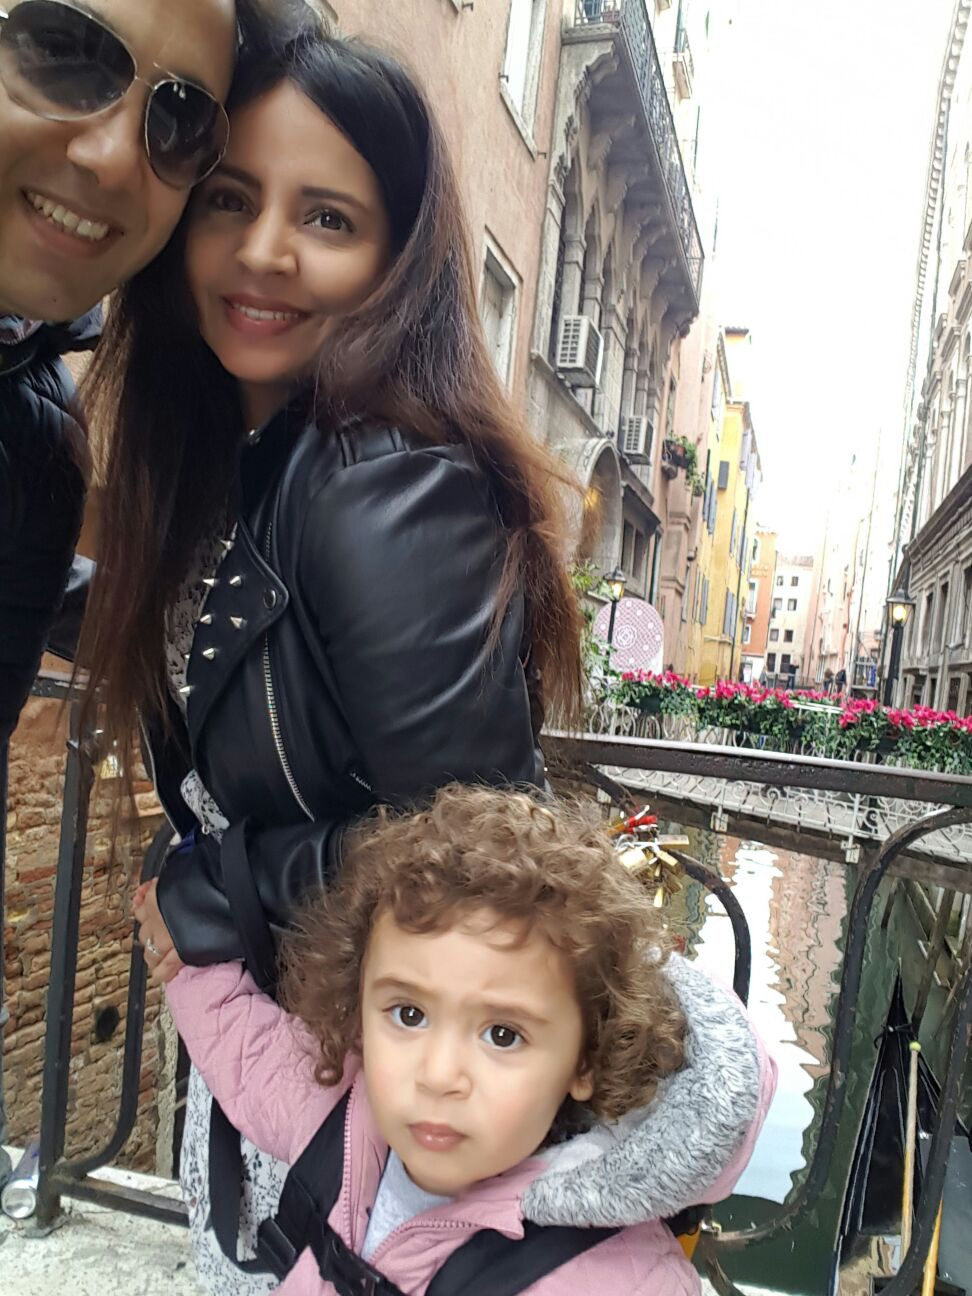 travel with kids children wanderlust experiences londongirlsabz venice canal